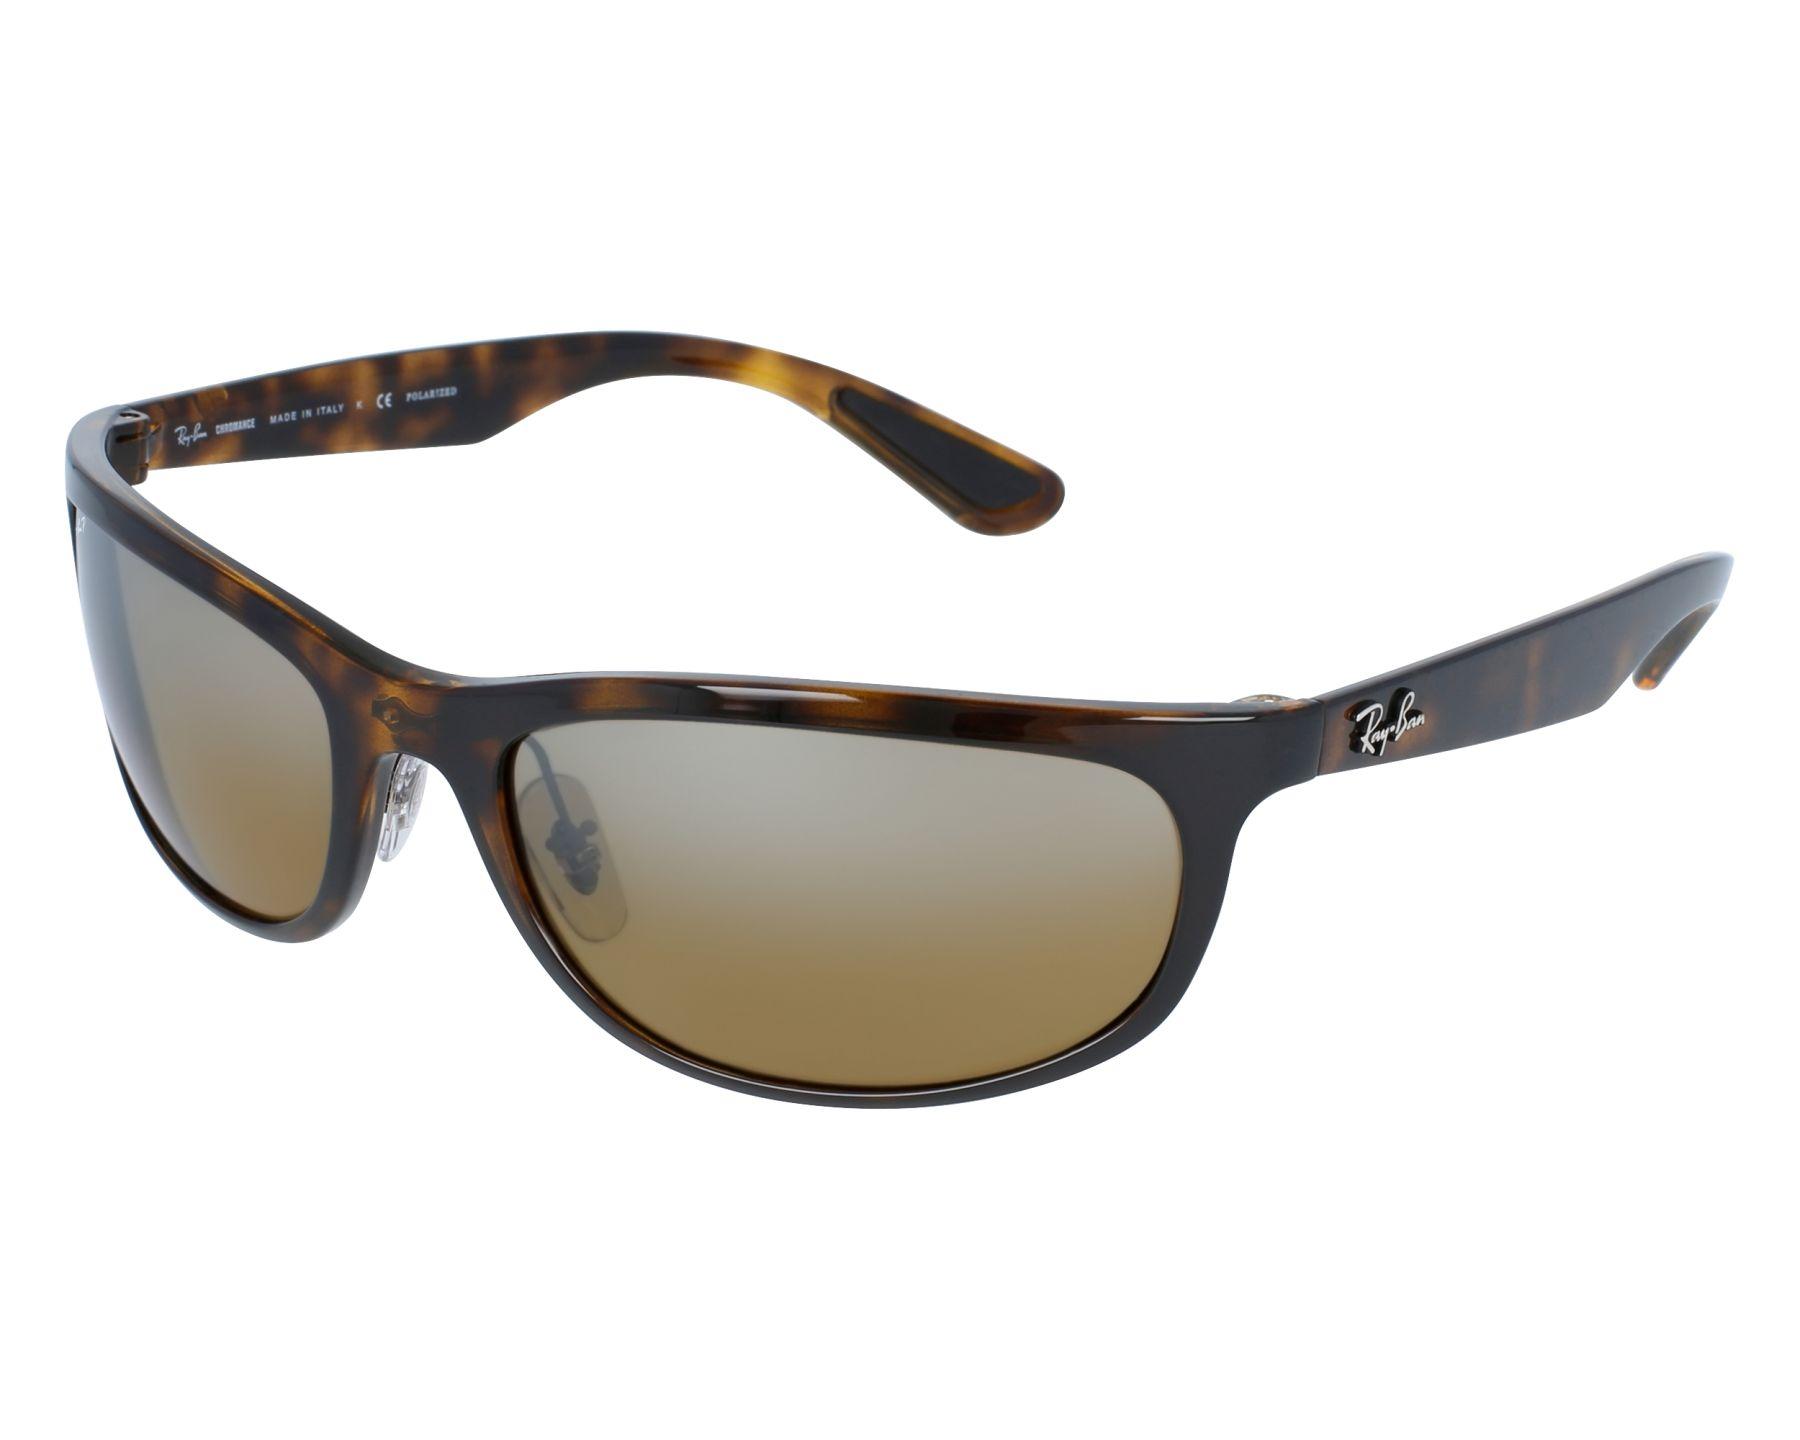 732c67885e7 thumbnail Sunglasses Ray-Ban RB-4265 710 A2 - Havana front view